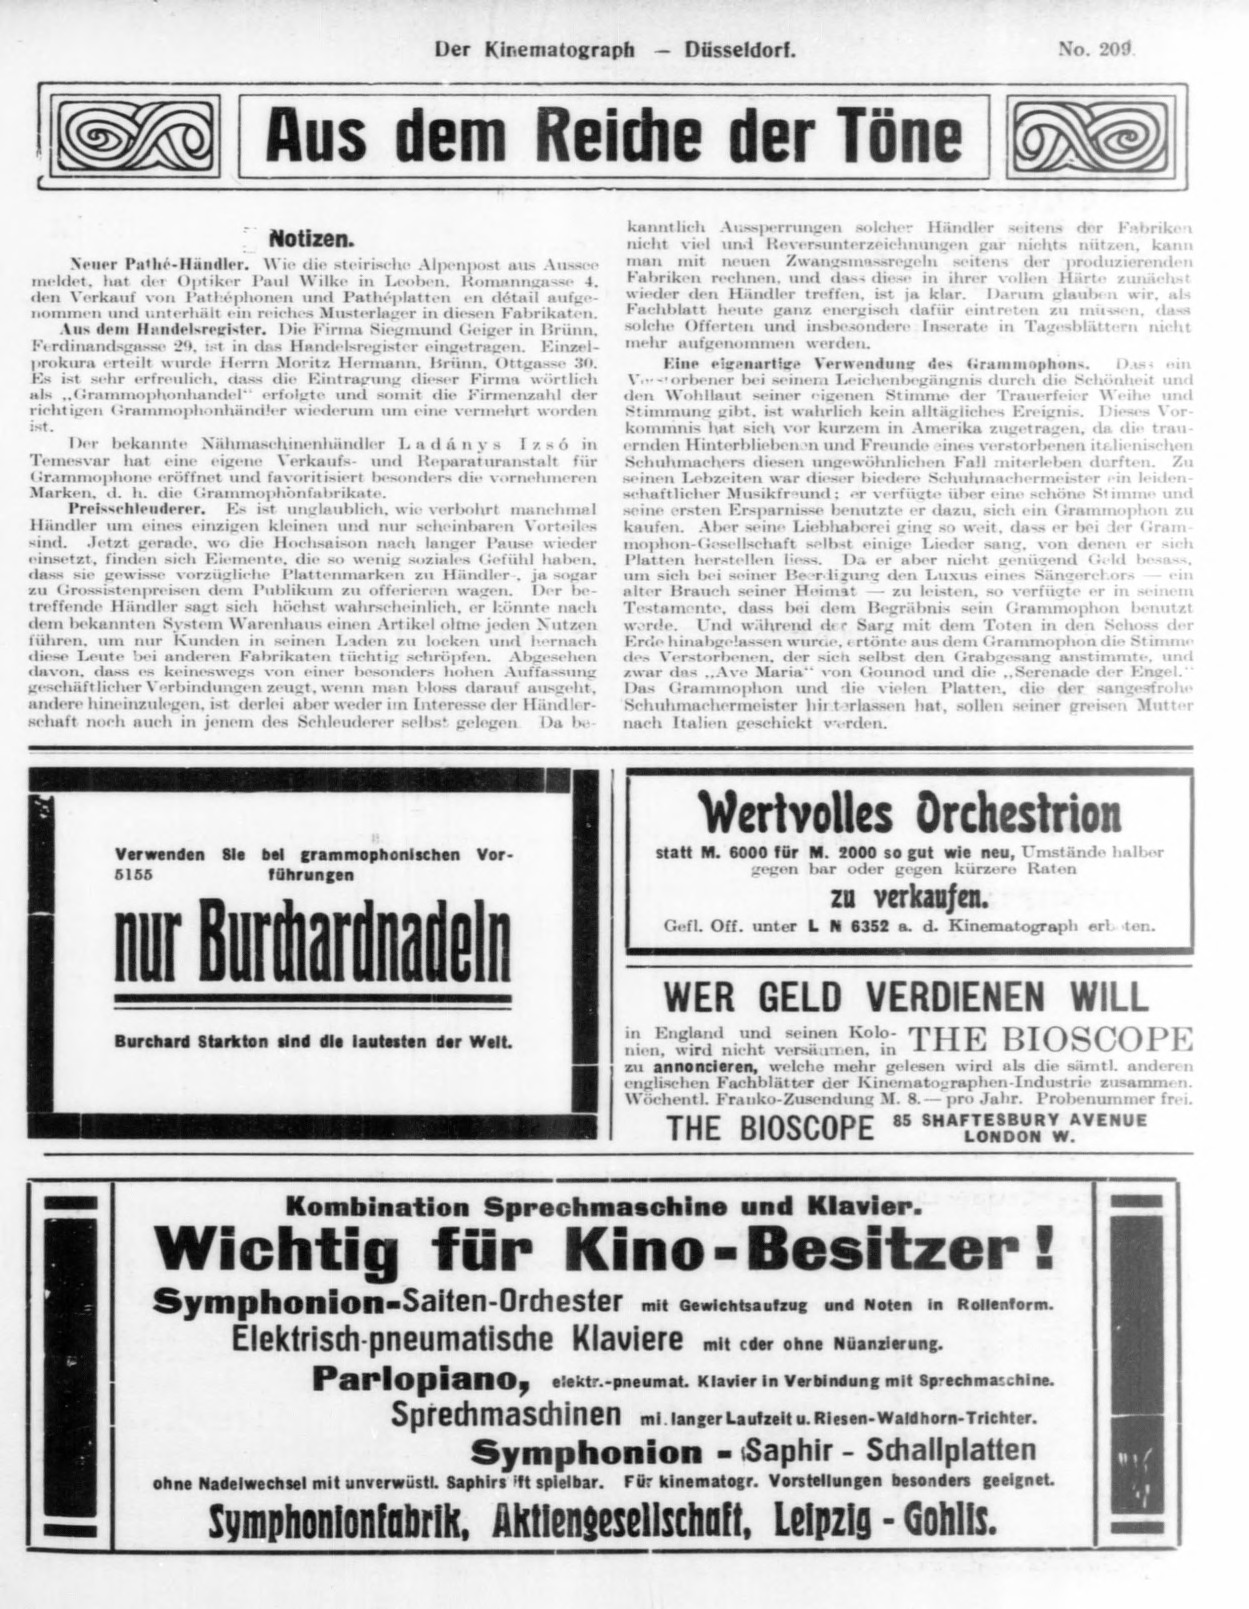 Kinematograph04-1910-12_jp2.zip&file=kinematograph04-1910-12_jp2%2fkinematograph04-1910-12_0110